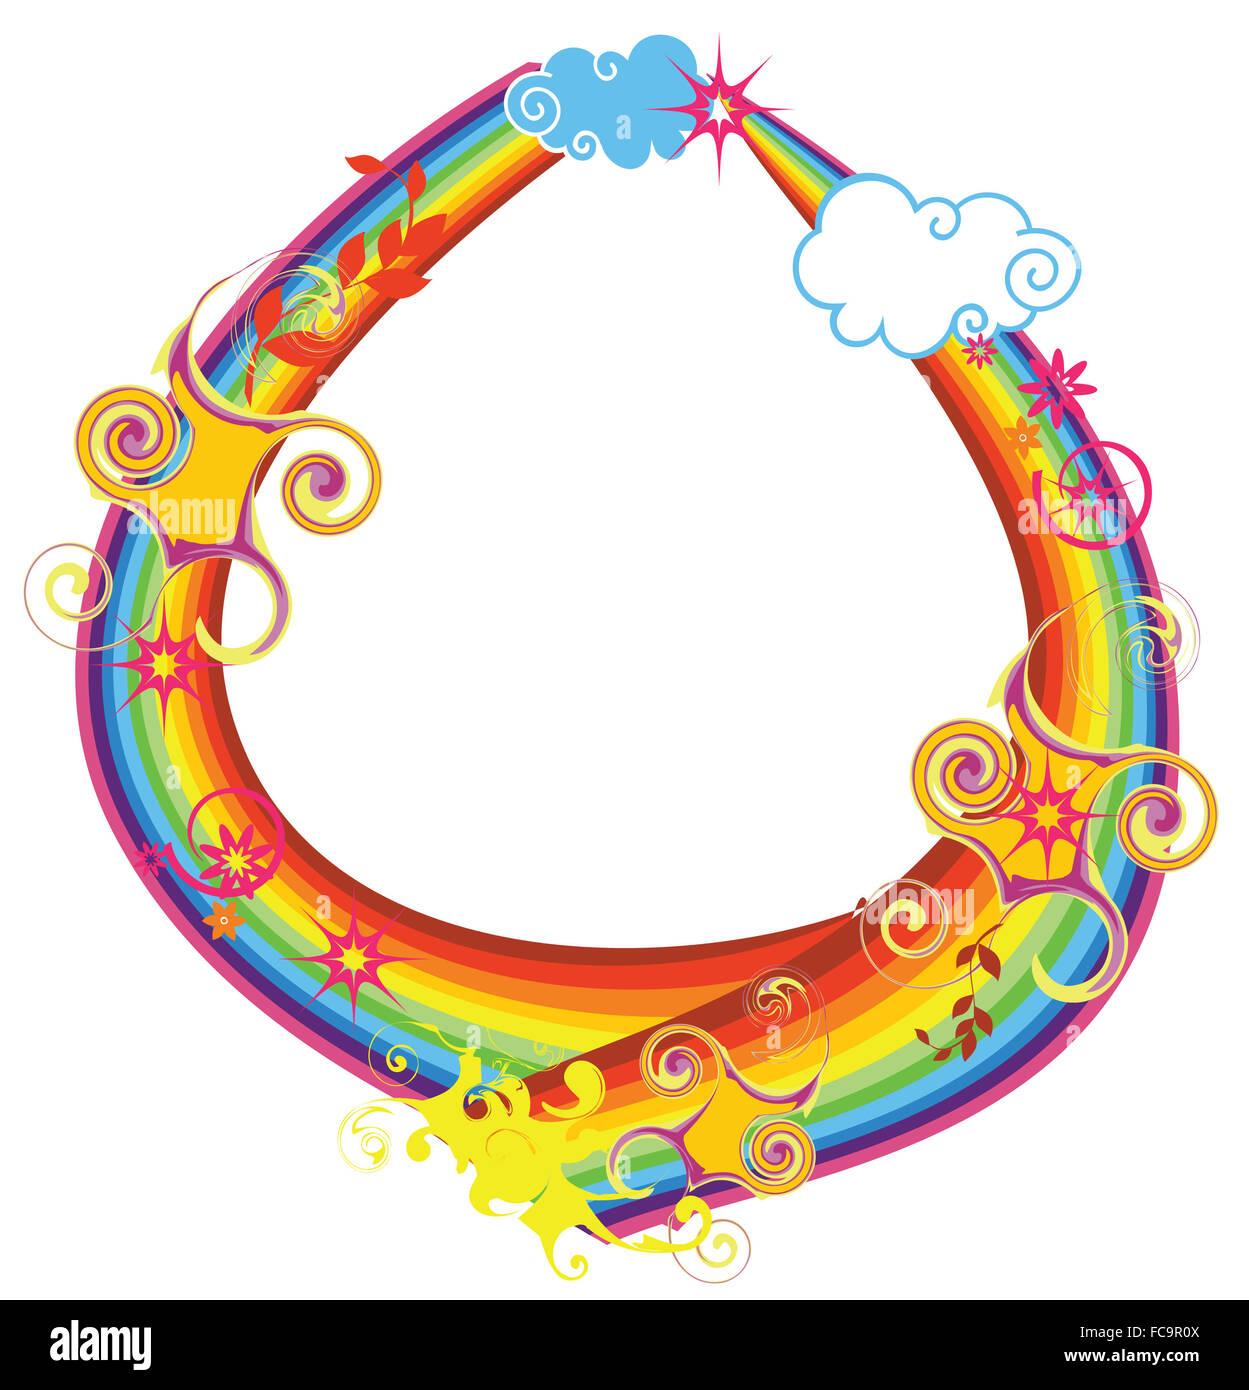 Rainbow letter o stock photo royalty free image 93643338 alamy rainbow letter o biocorpaavc